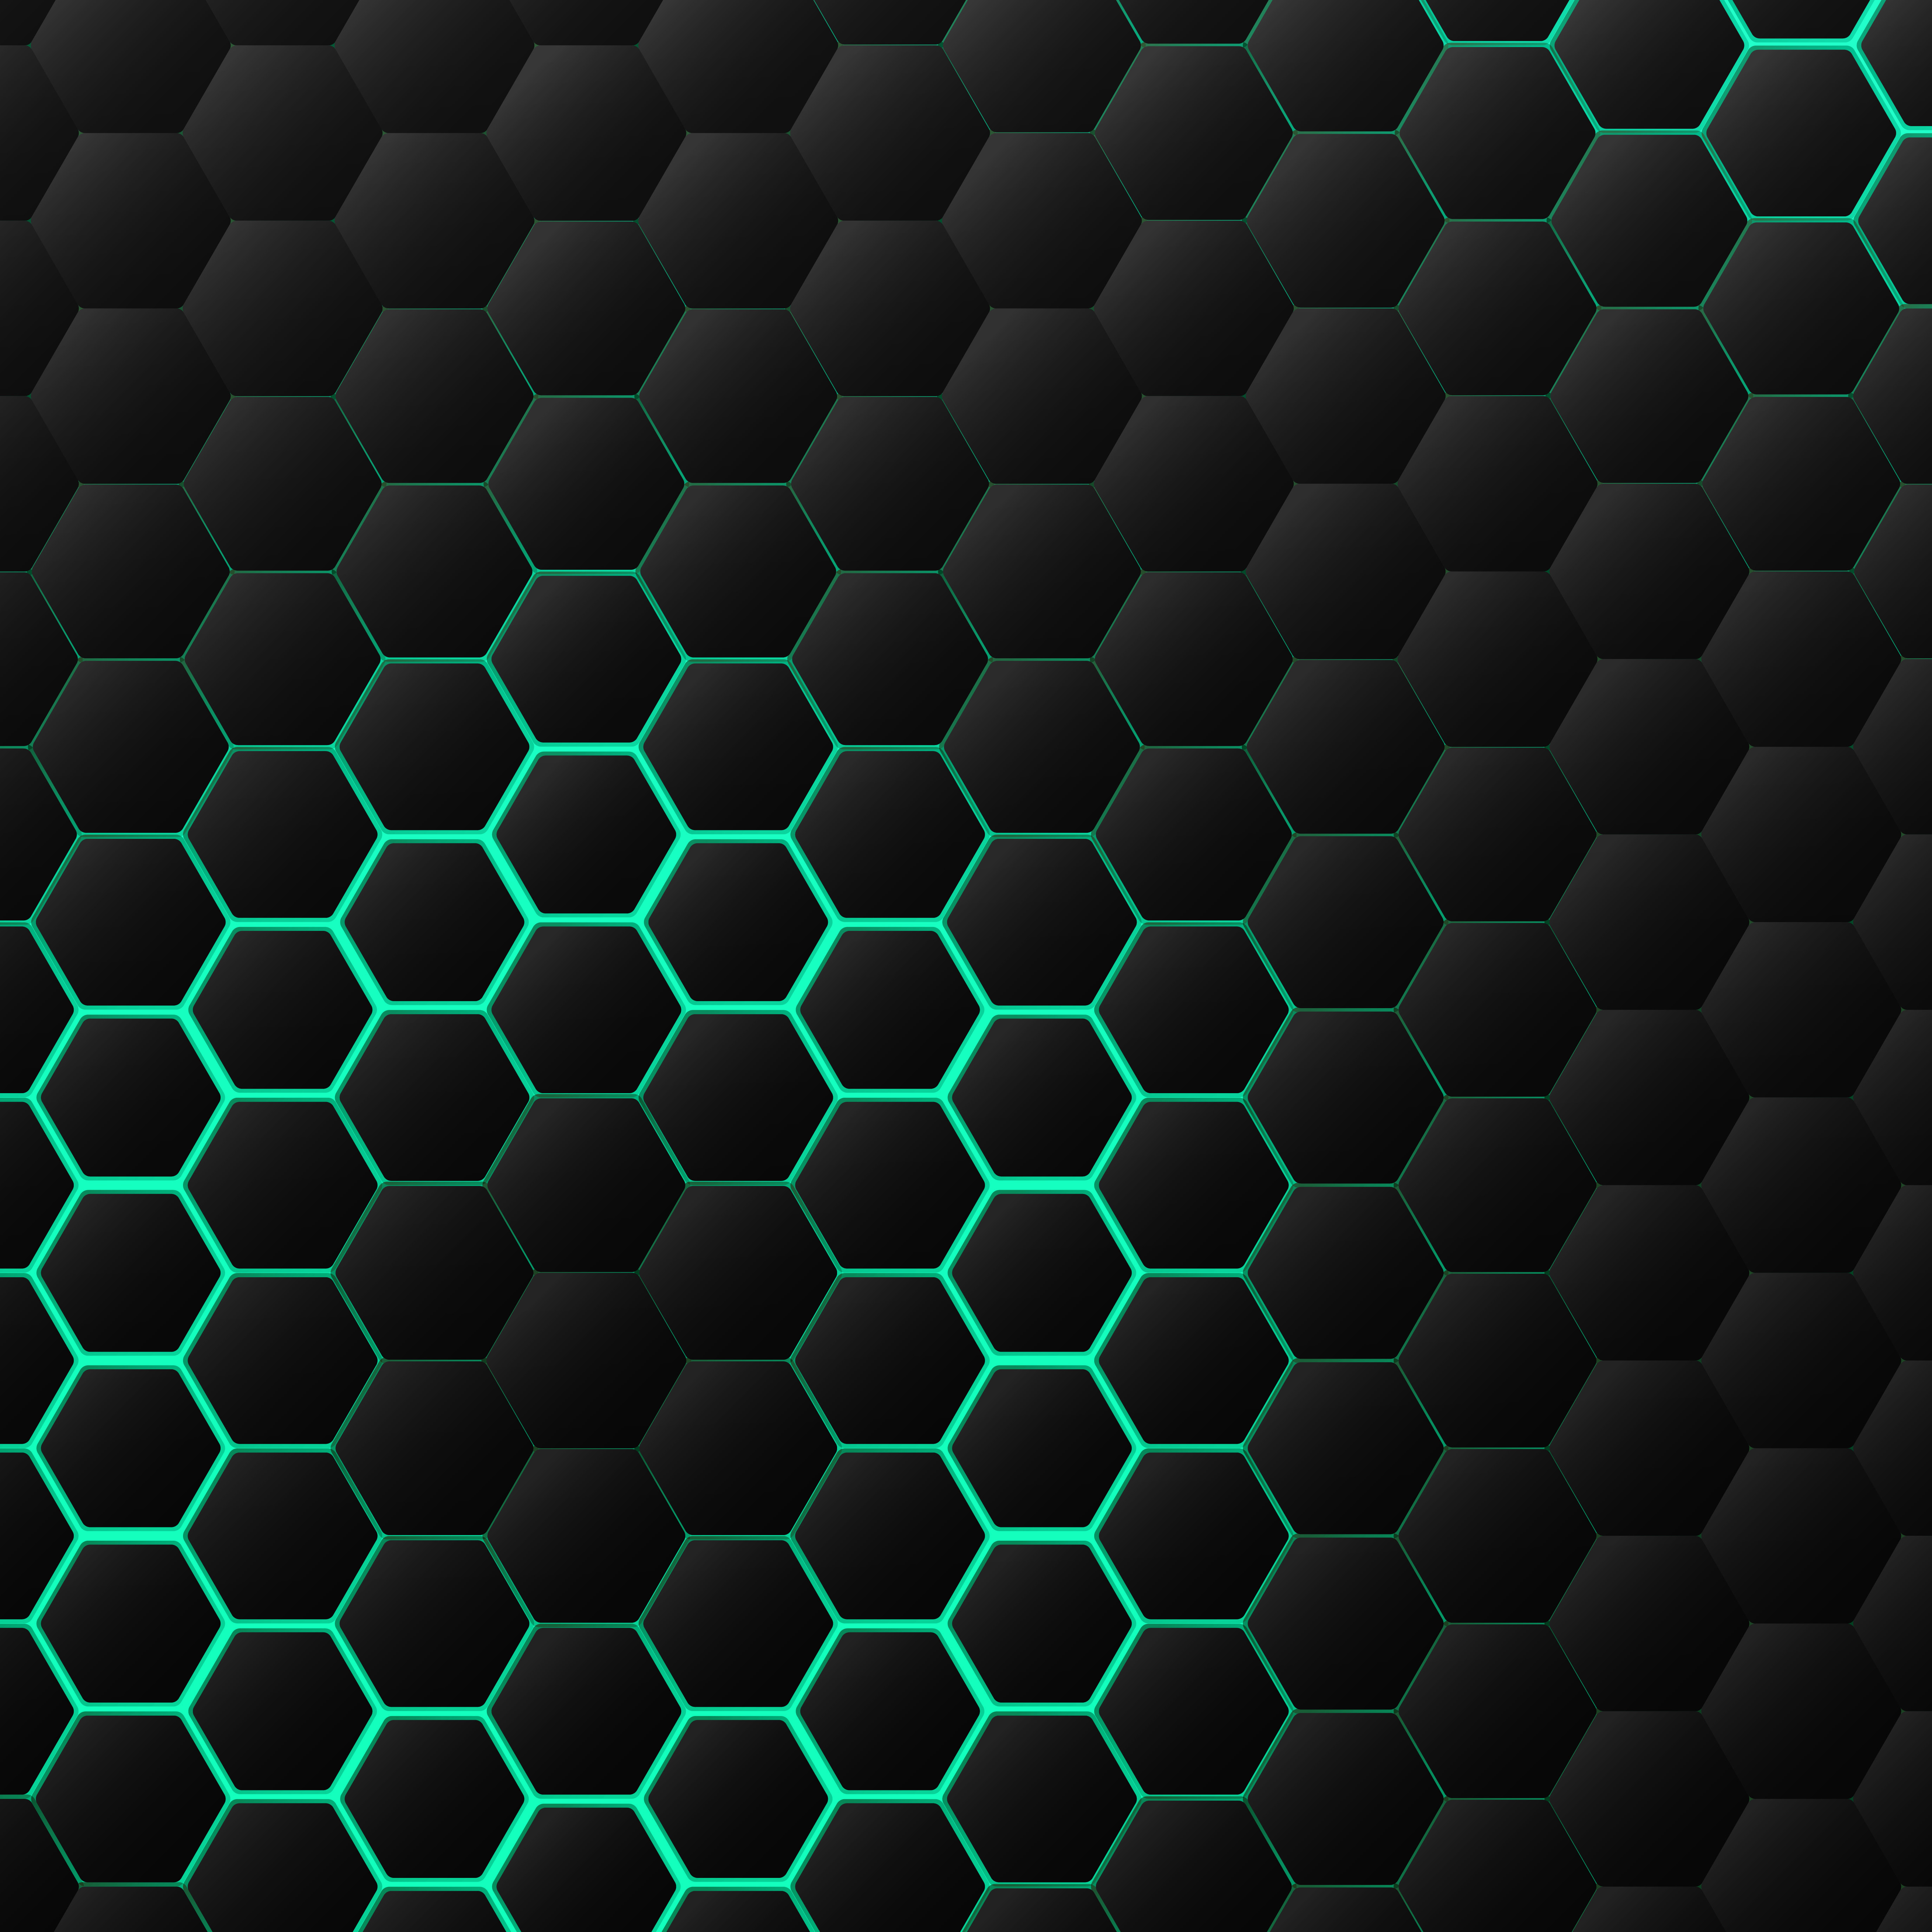 Black And Green Hexagonal Technology Pattern Design